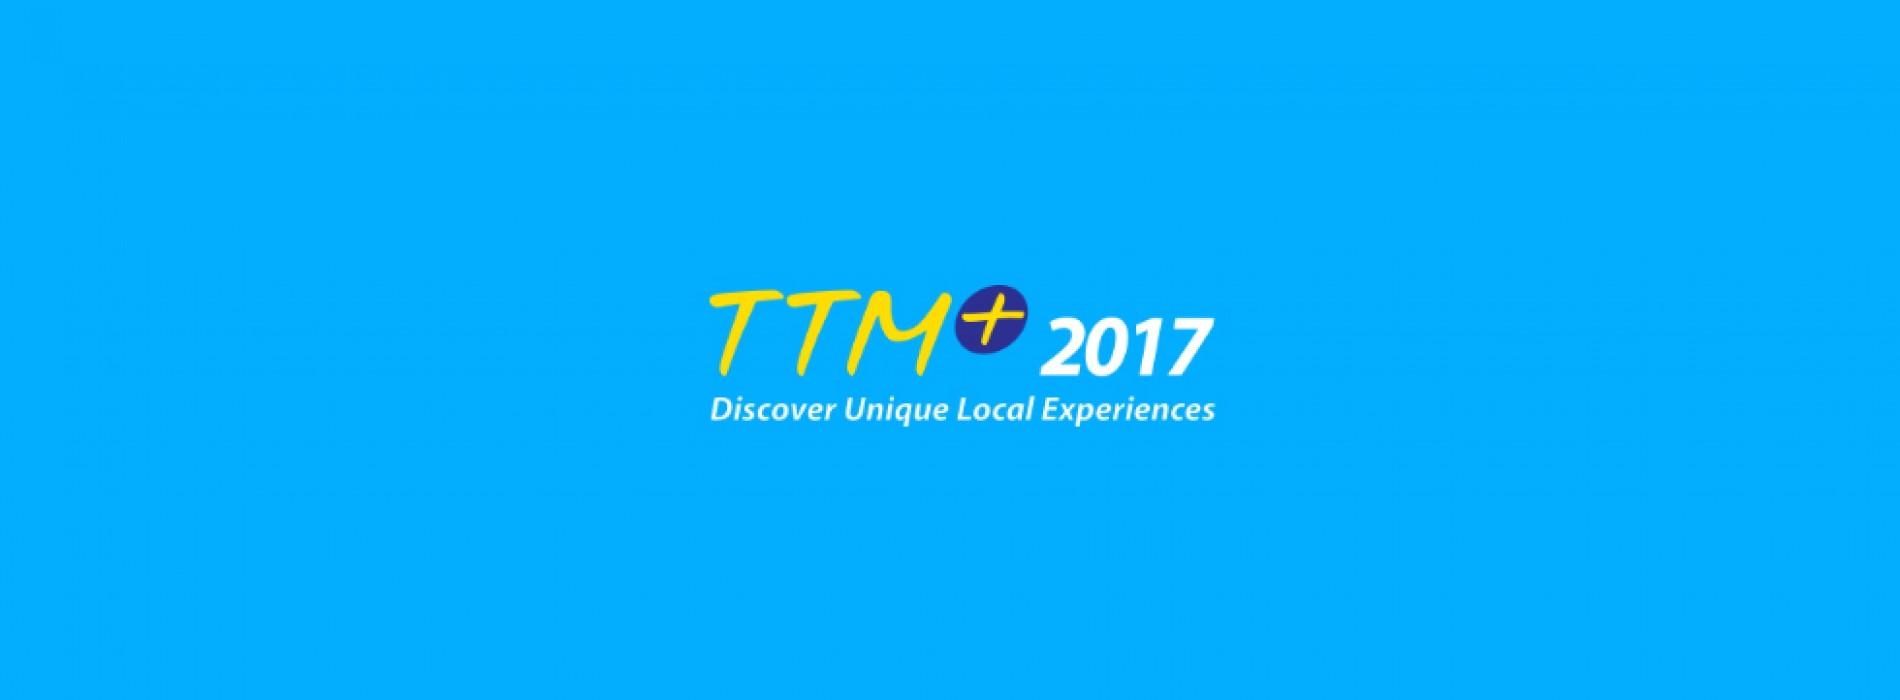 TTM+ Thailand's largest B2B tourism trade event announces its 16th edition